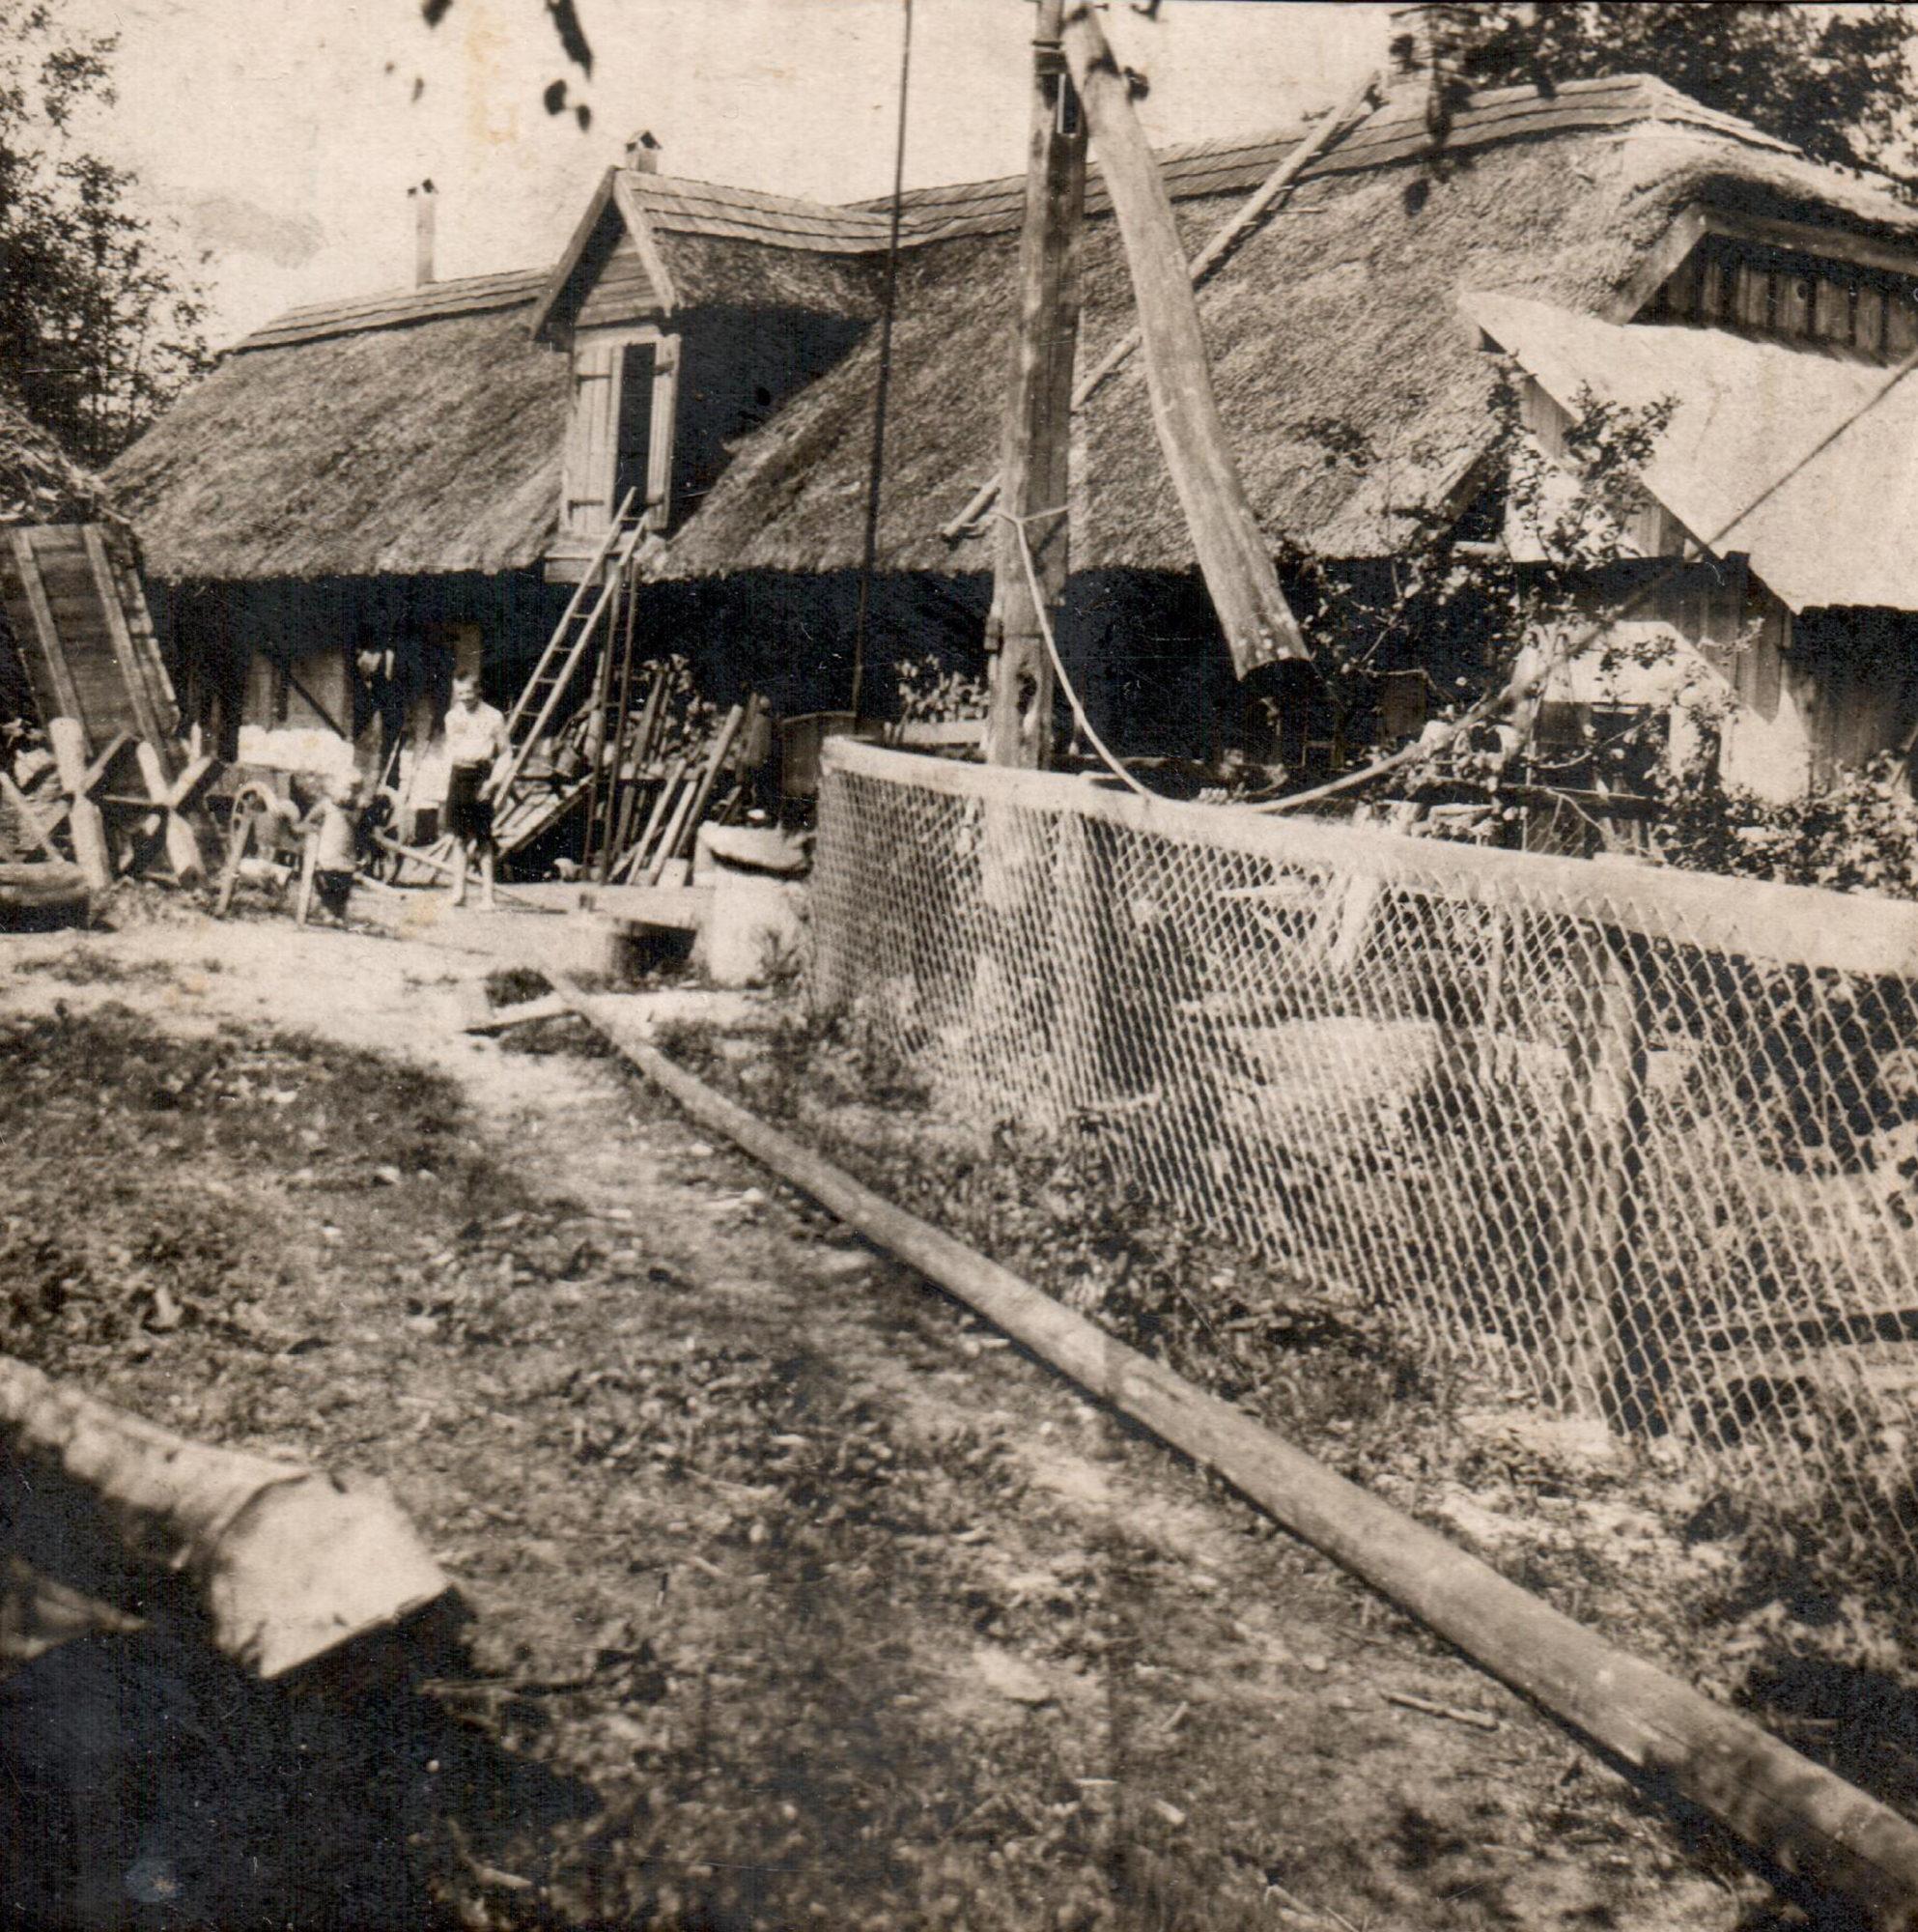 Main house of the Alberti family, 1940's.